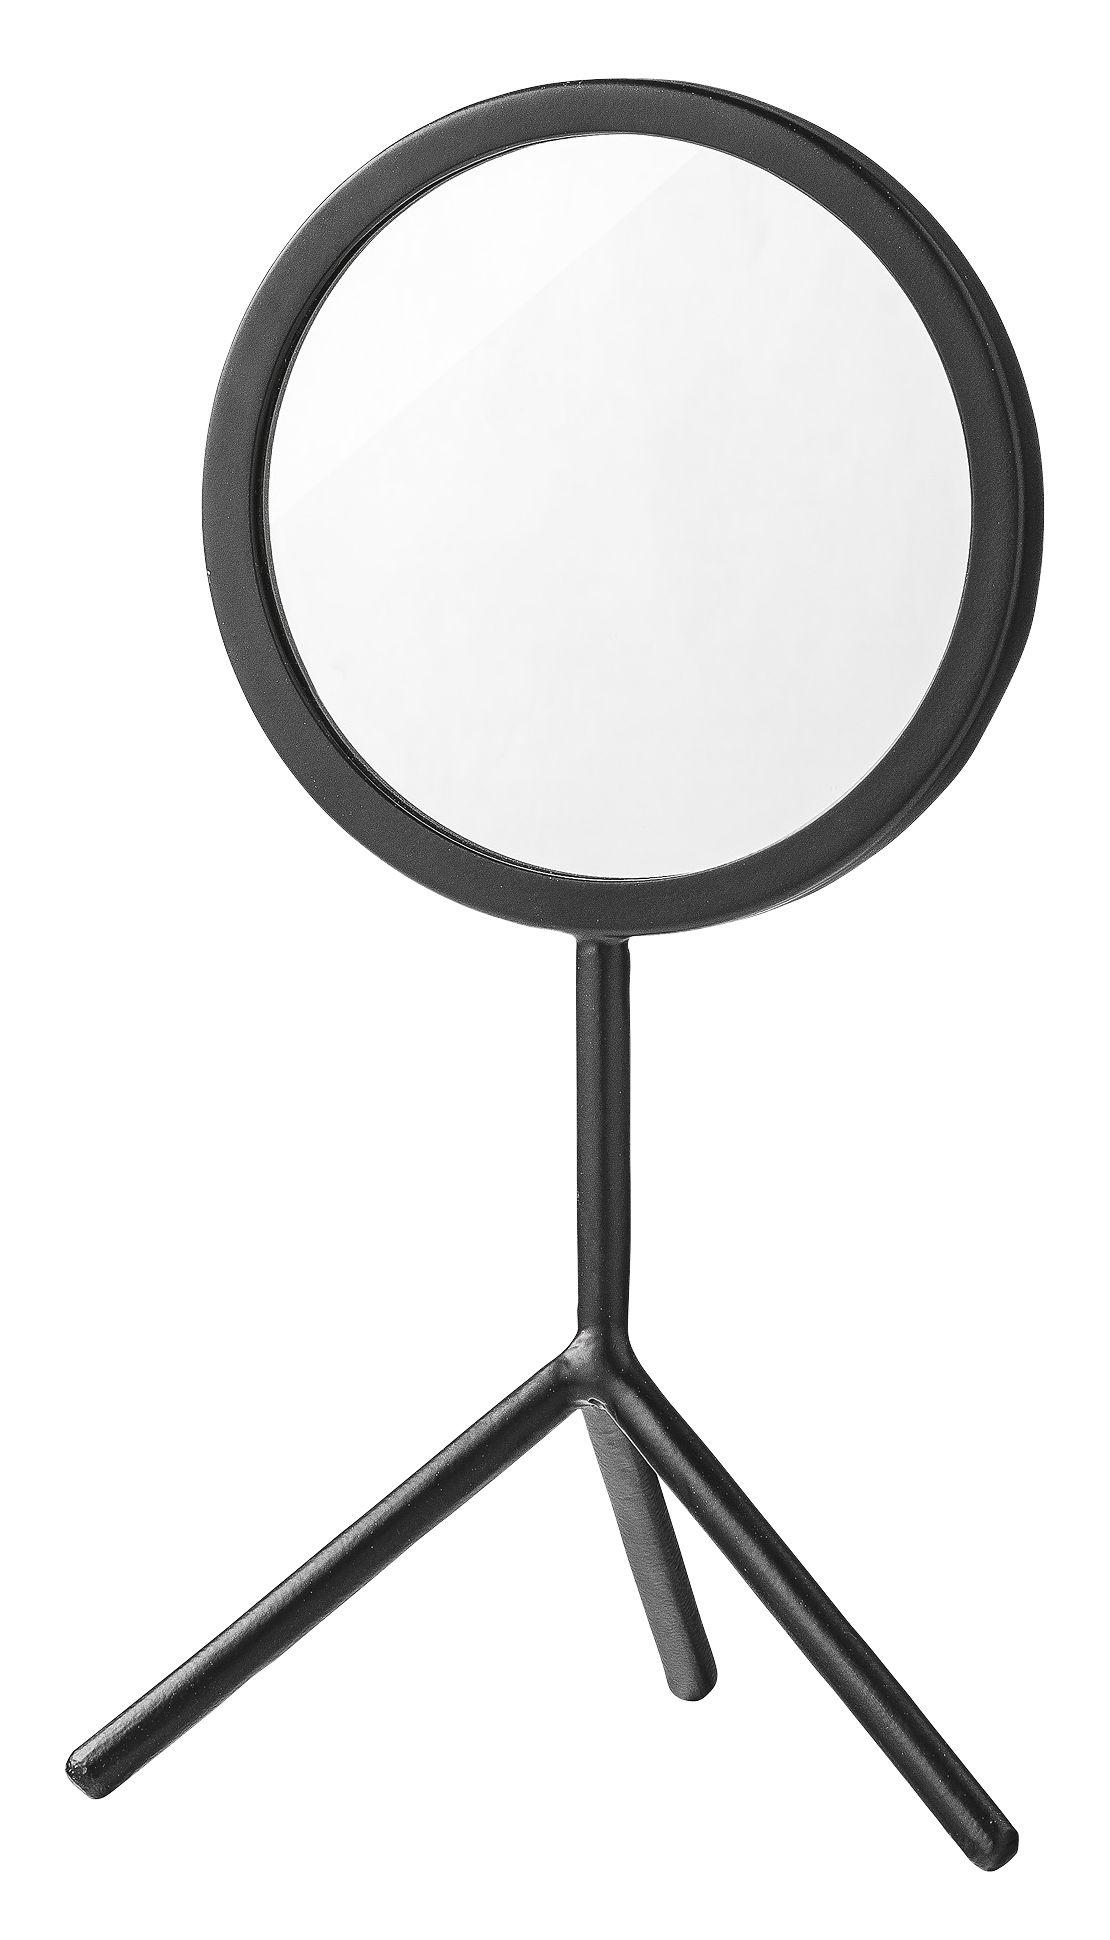 miroir tripod a poser h 36 cm noir bloomingville ForMiroir Tripod